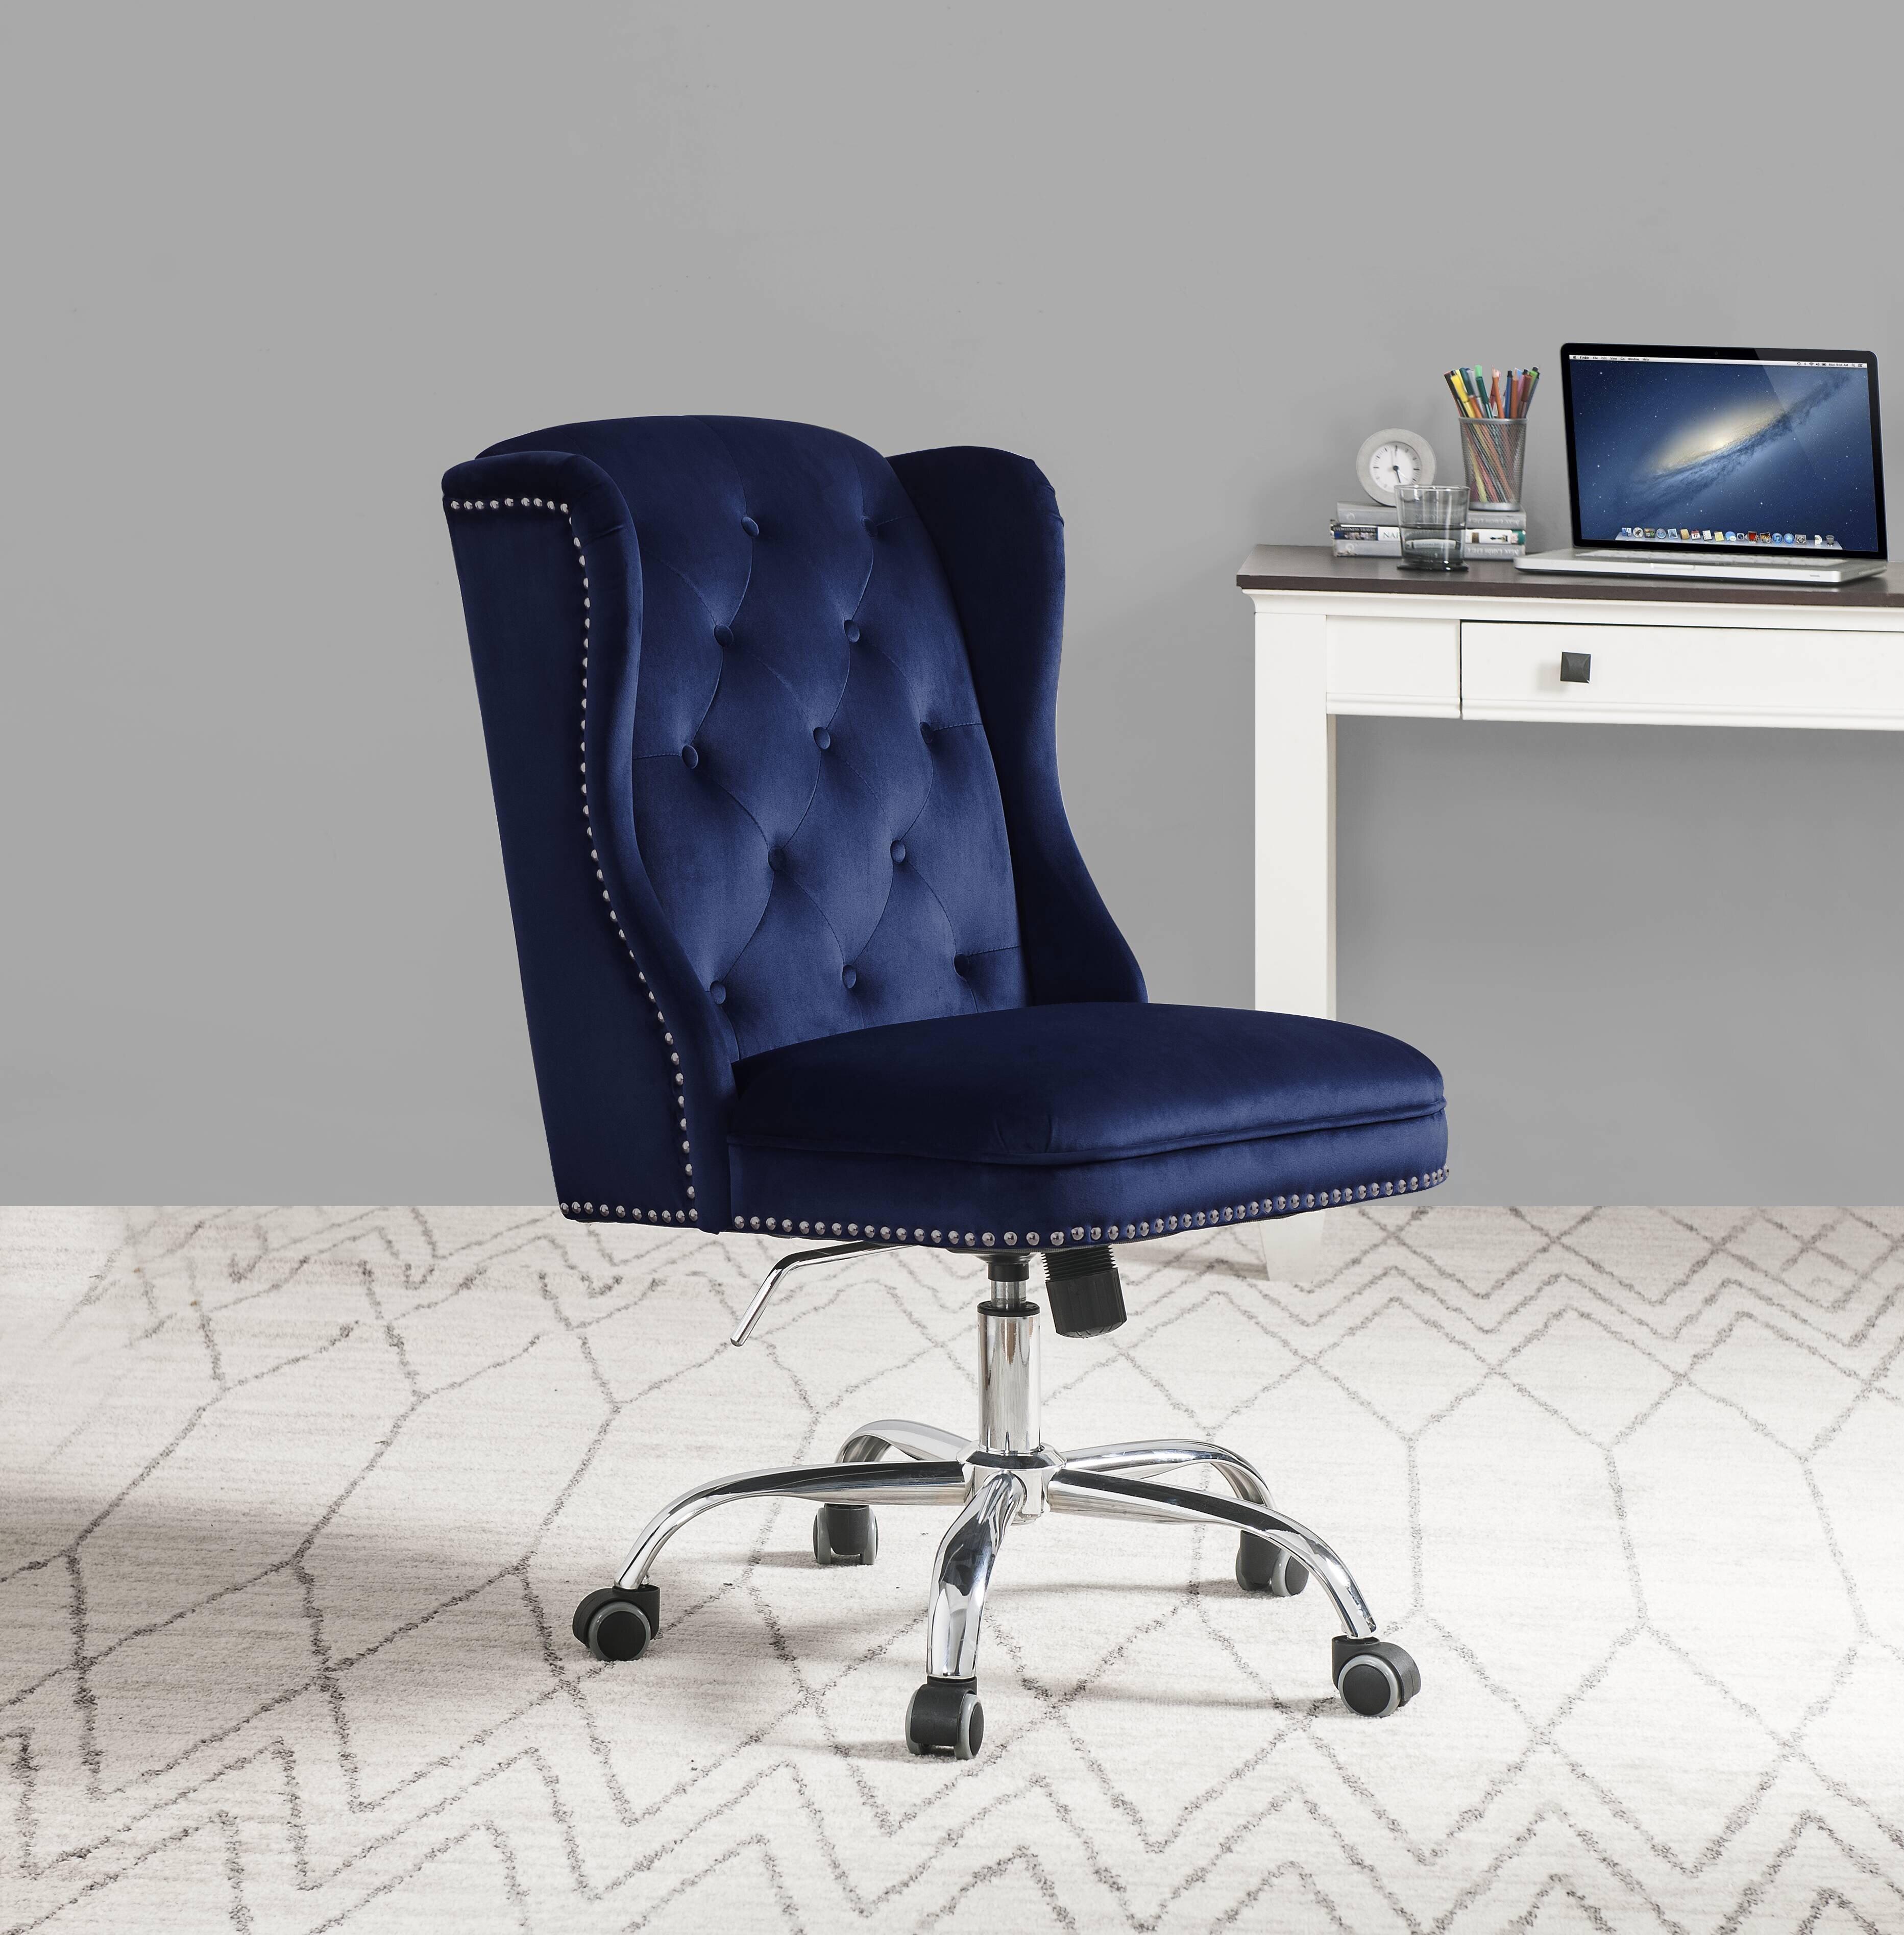 300lbs 400lbs Capacity Velvet Office Chairs You Ll Love In 2021 Wayfair